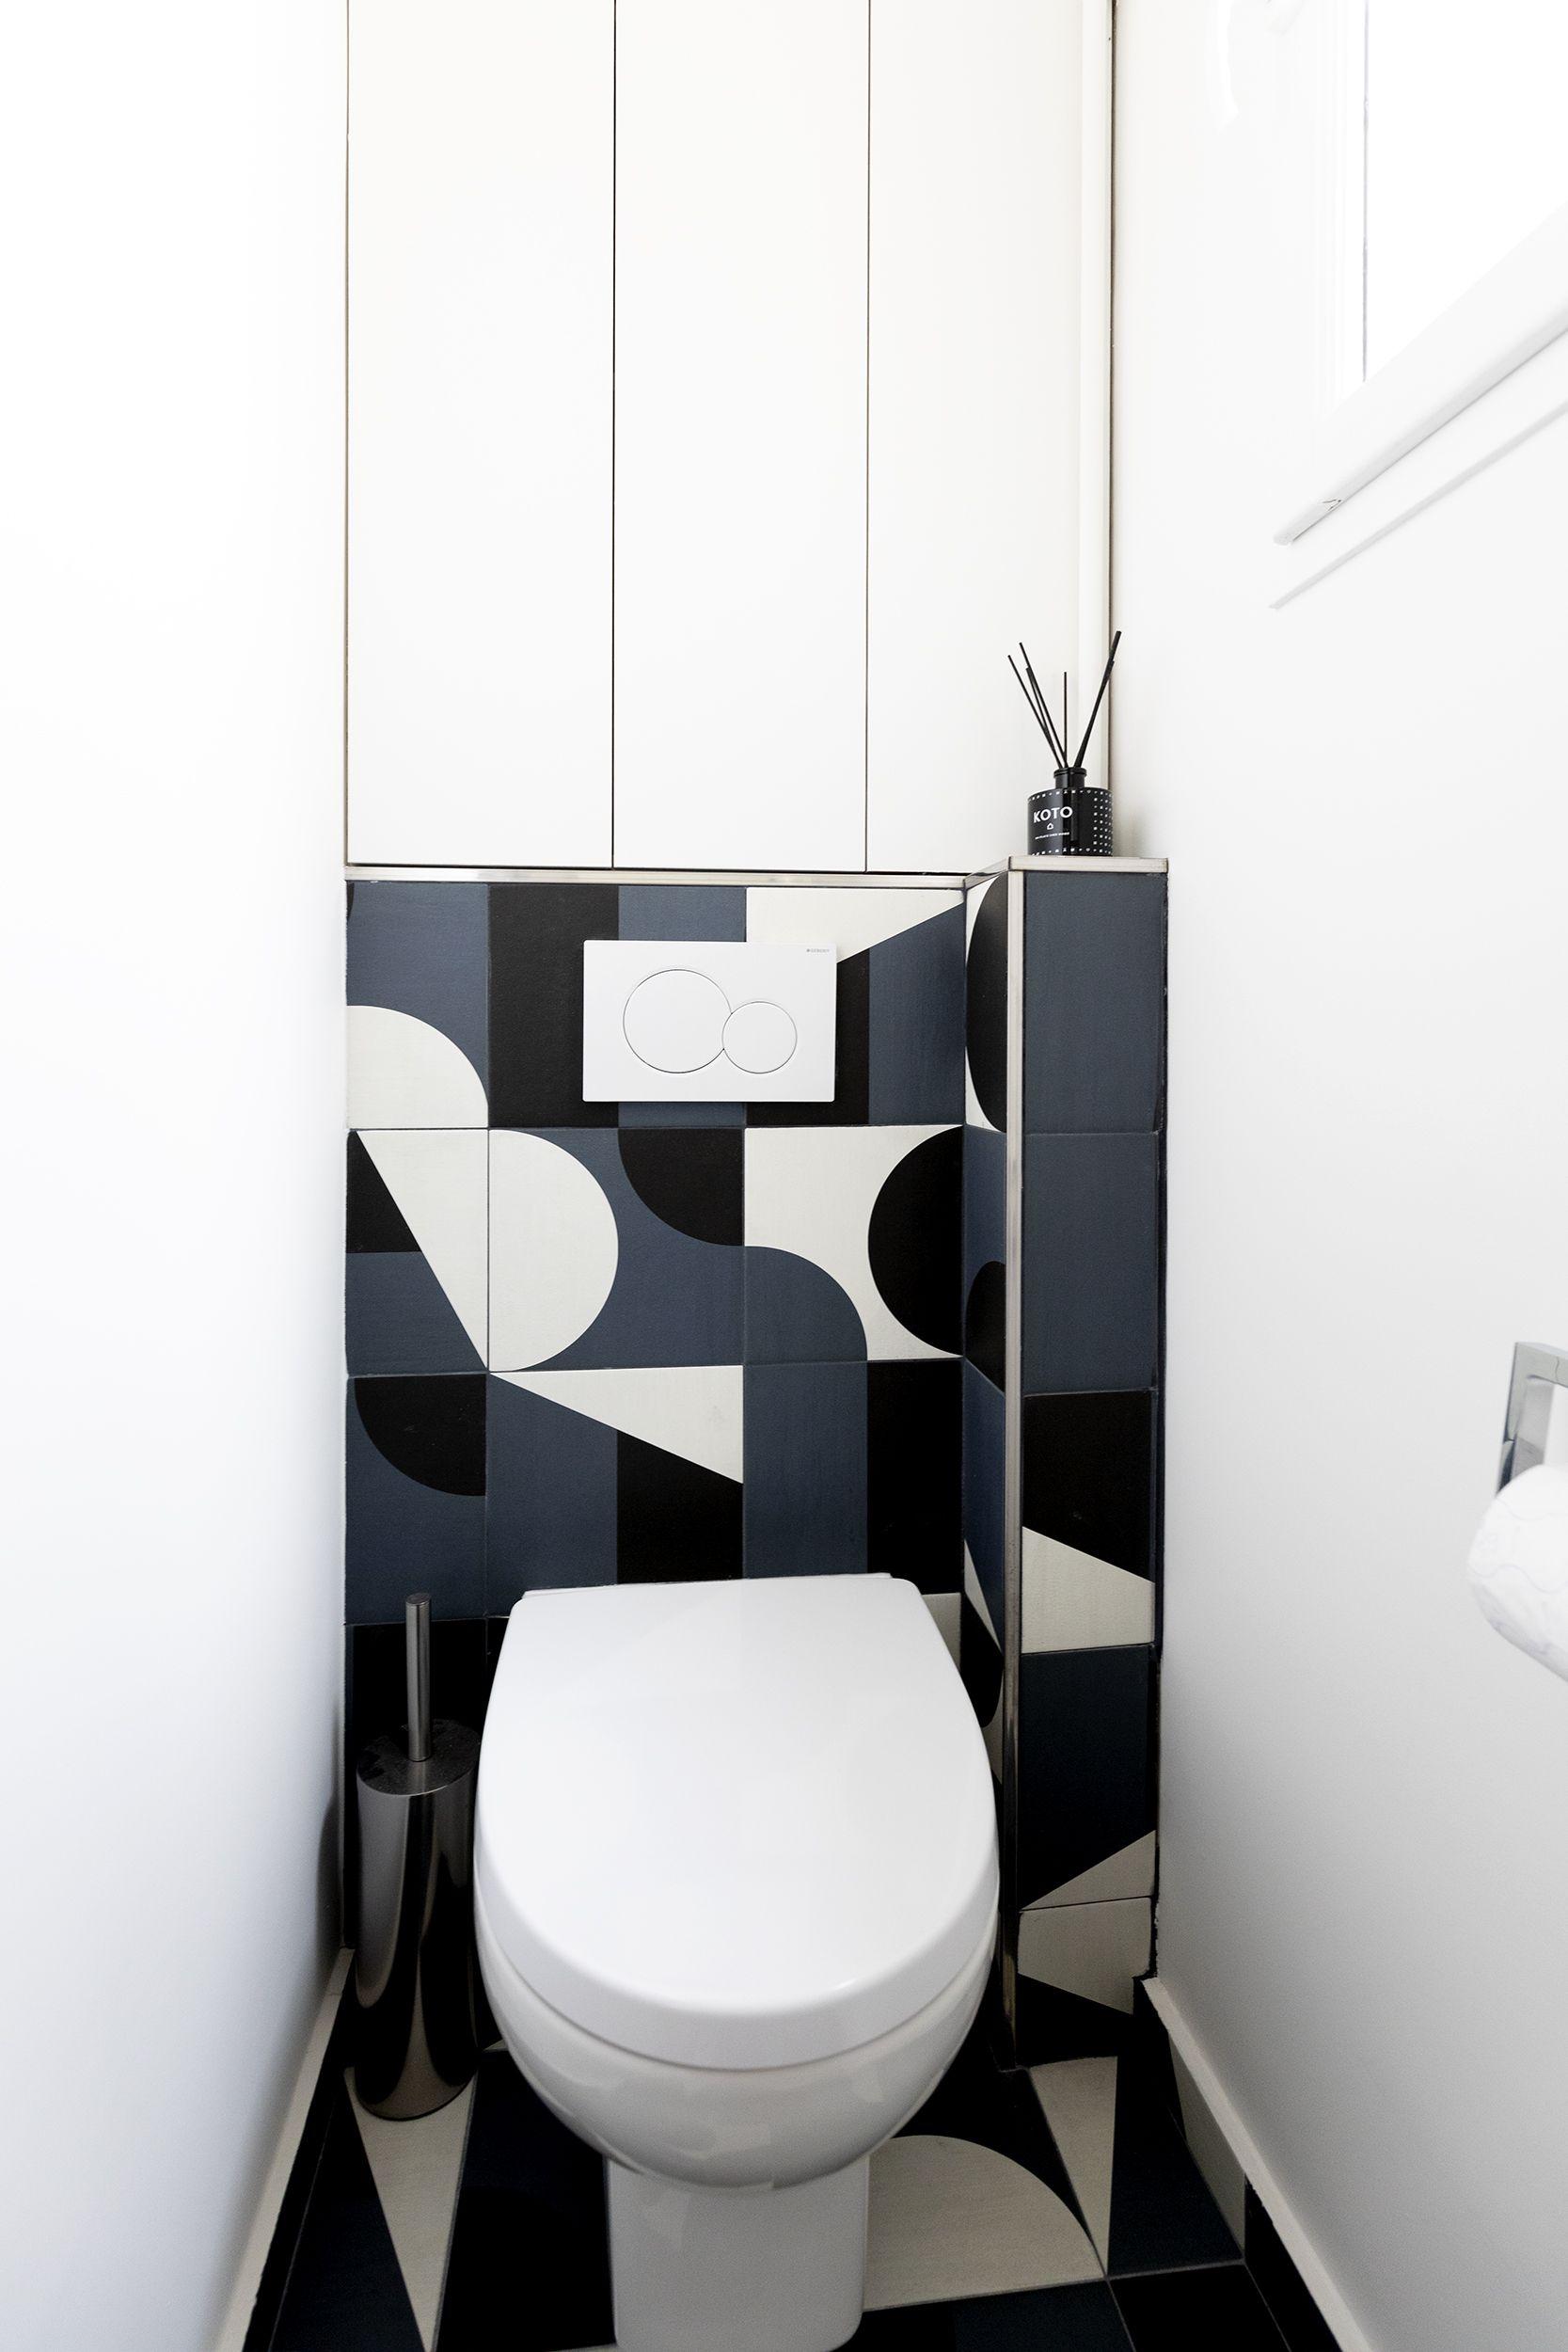 Toilettes Design Toilette Design Carrelage Toilette Toilettes